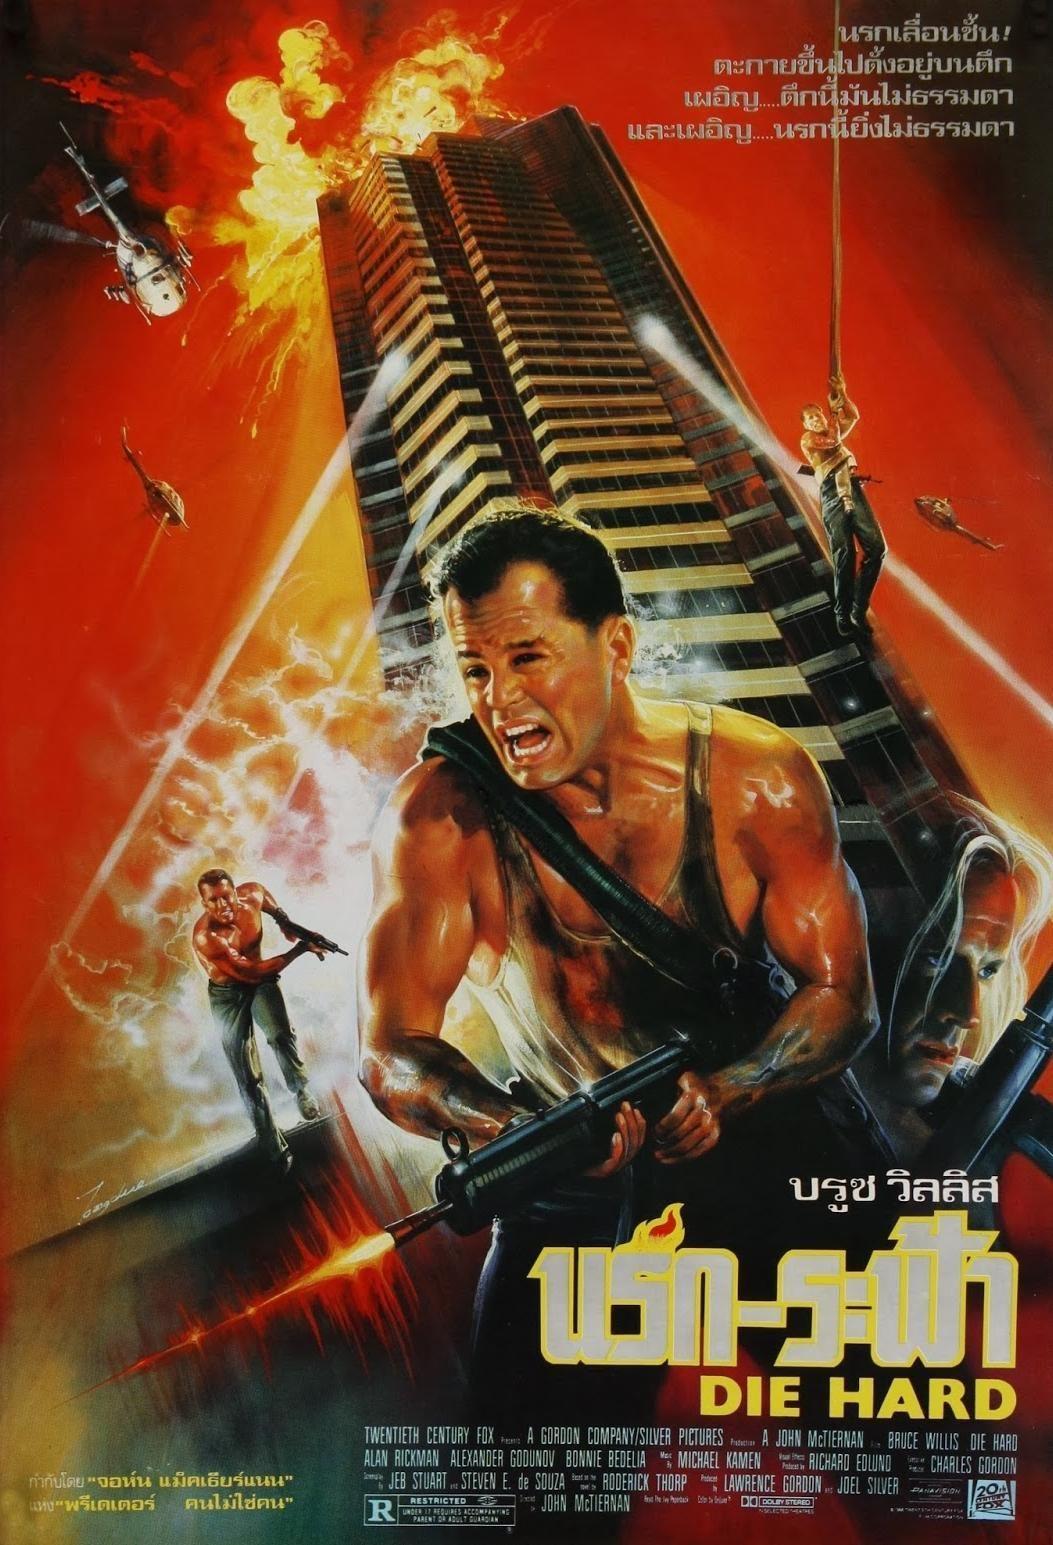 Dumb Mirror Best Movie Posters Hard Movie Best Action Movies